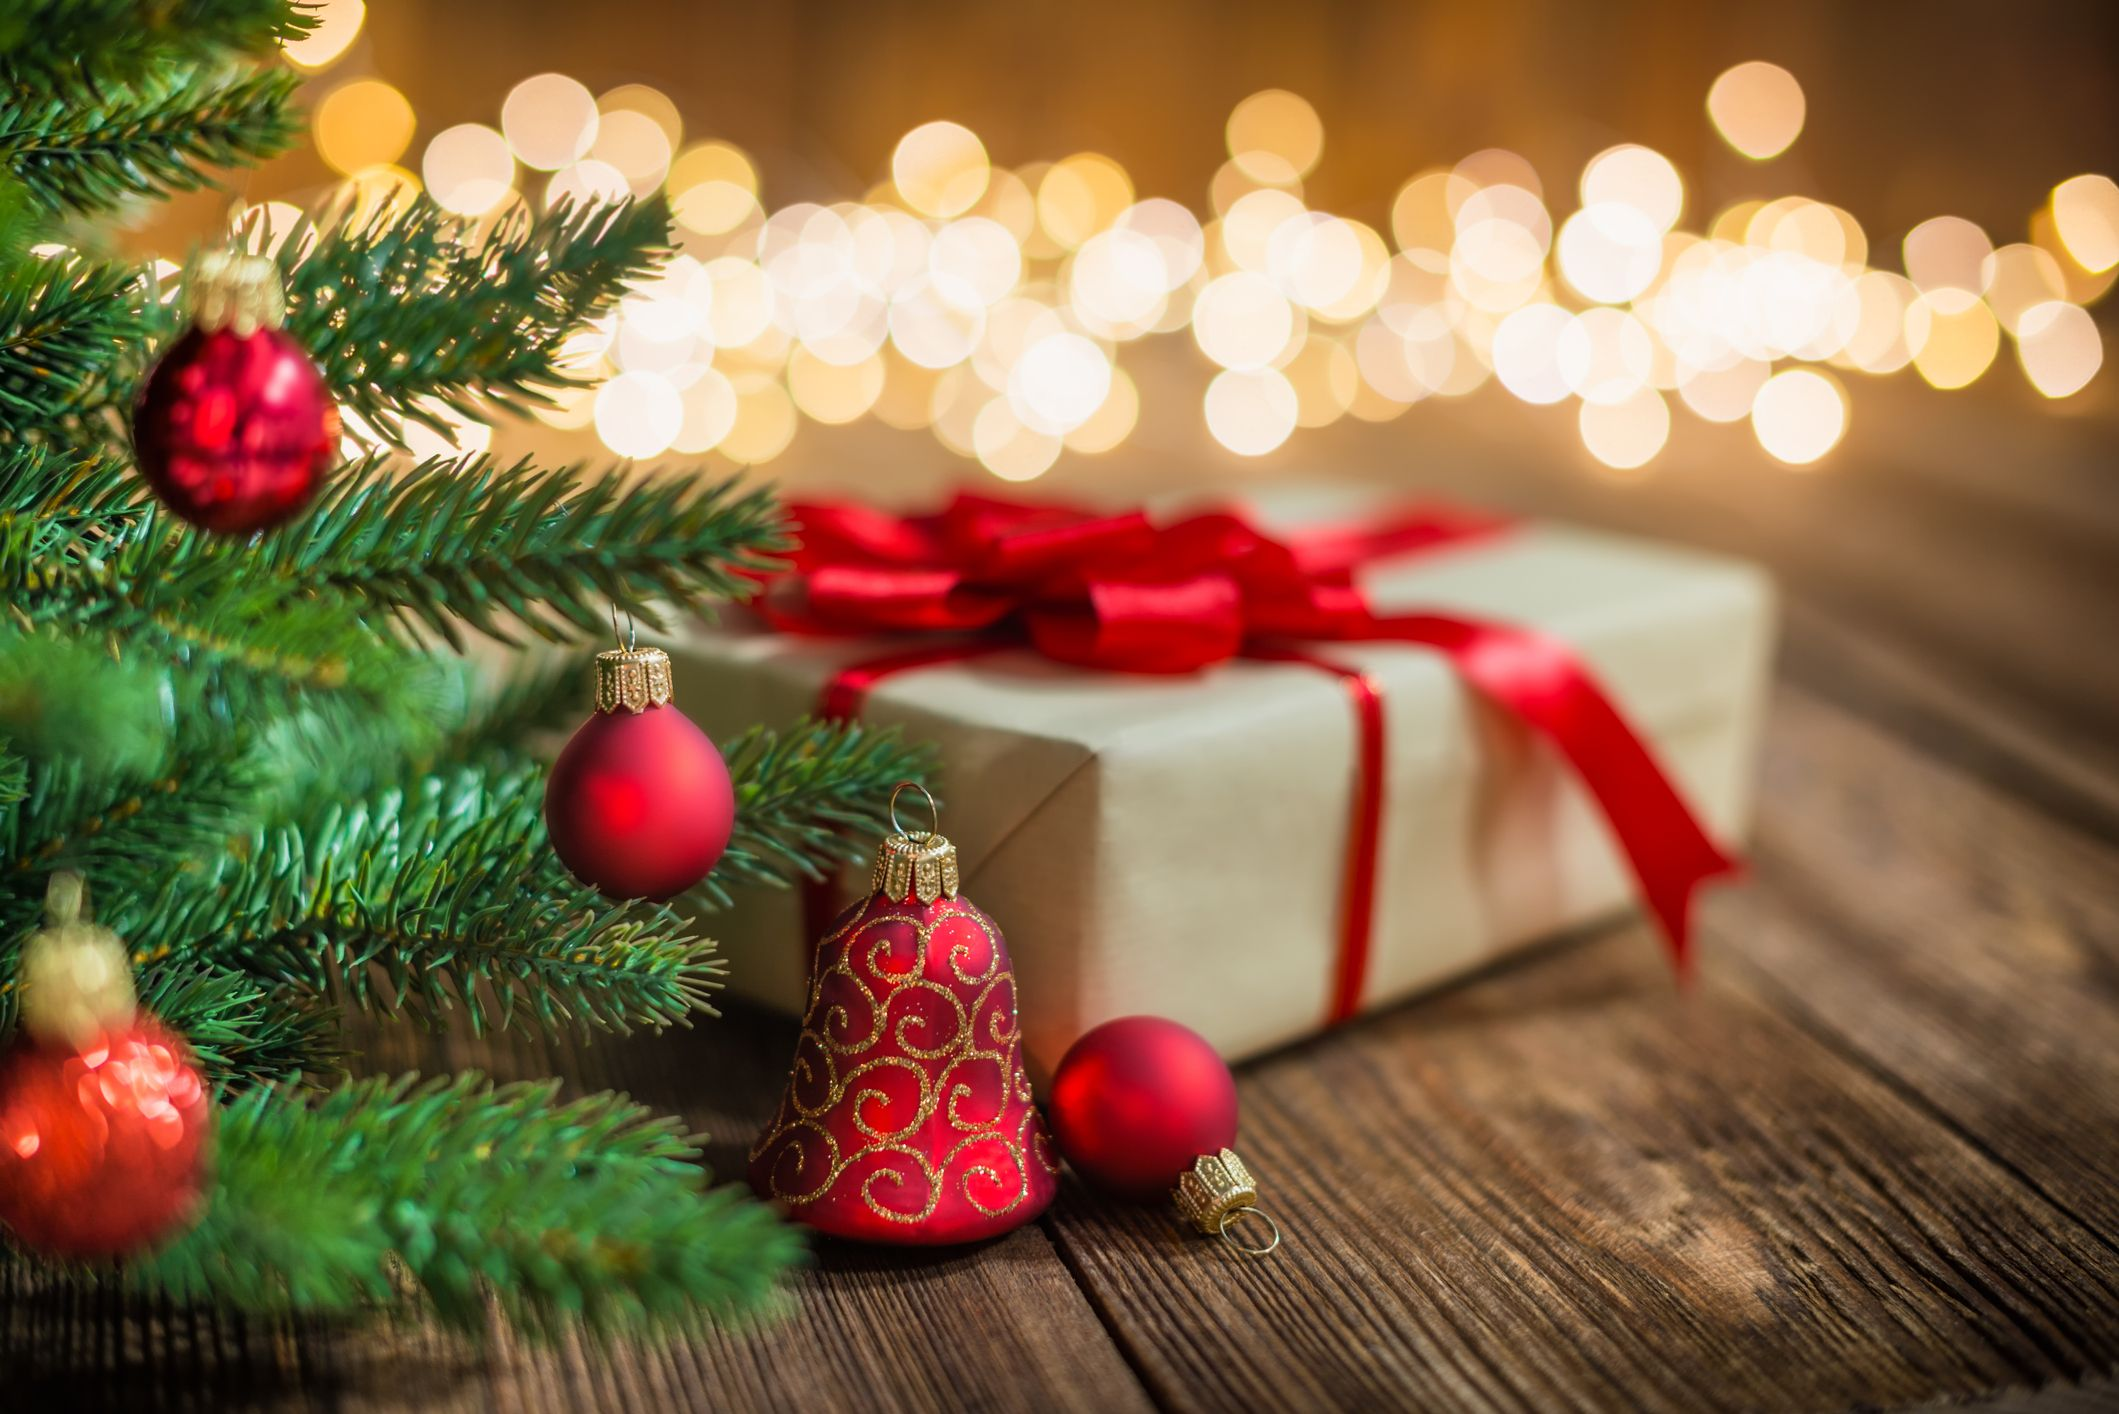 Inspirational Christmas Ornaments